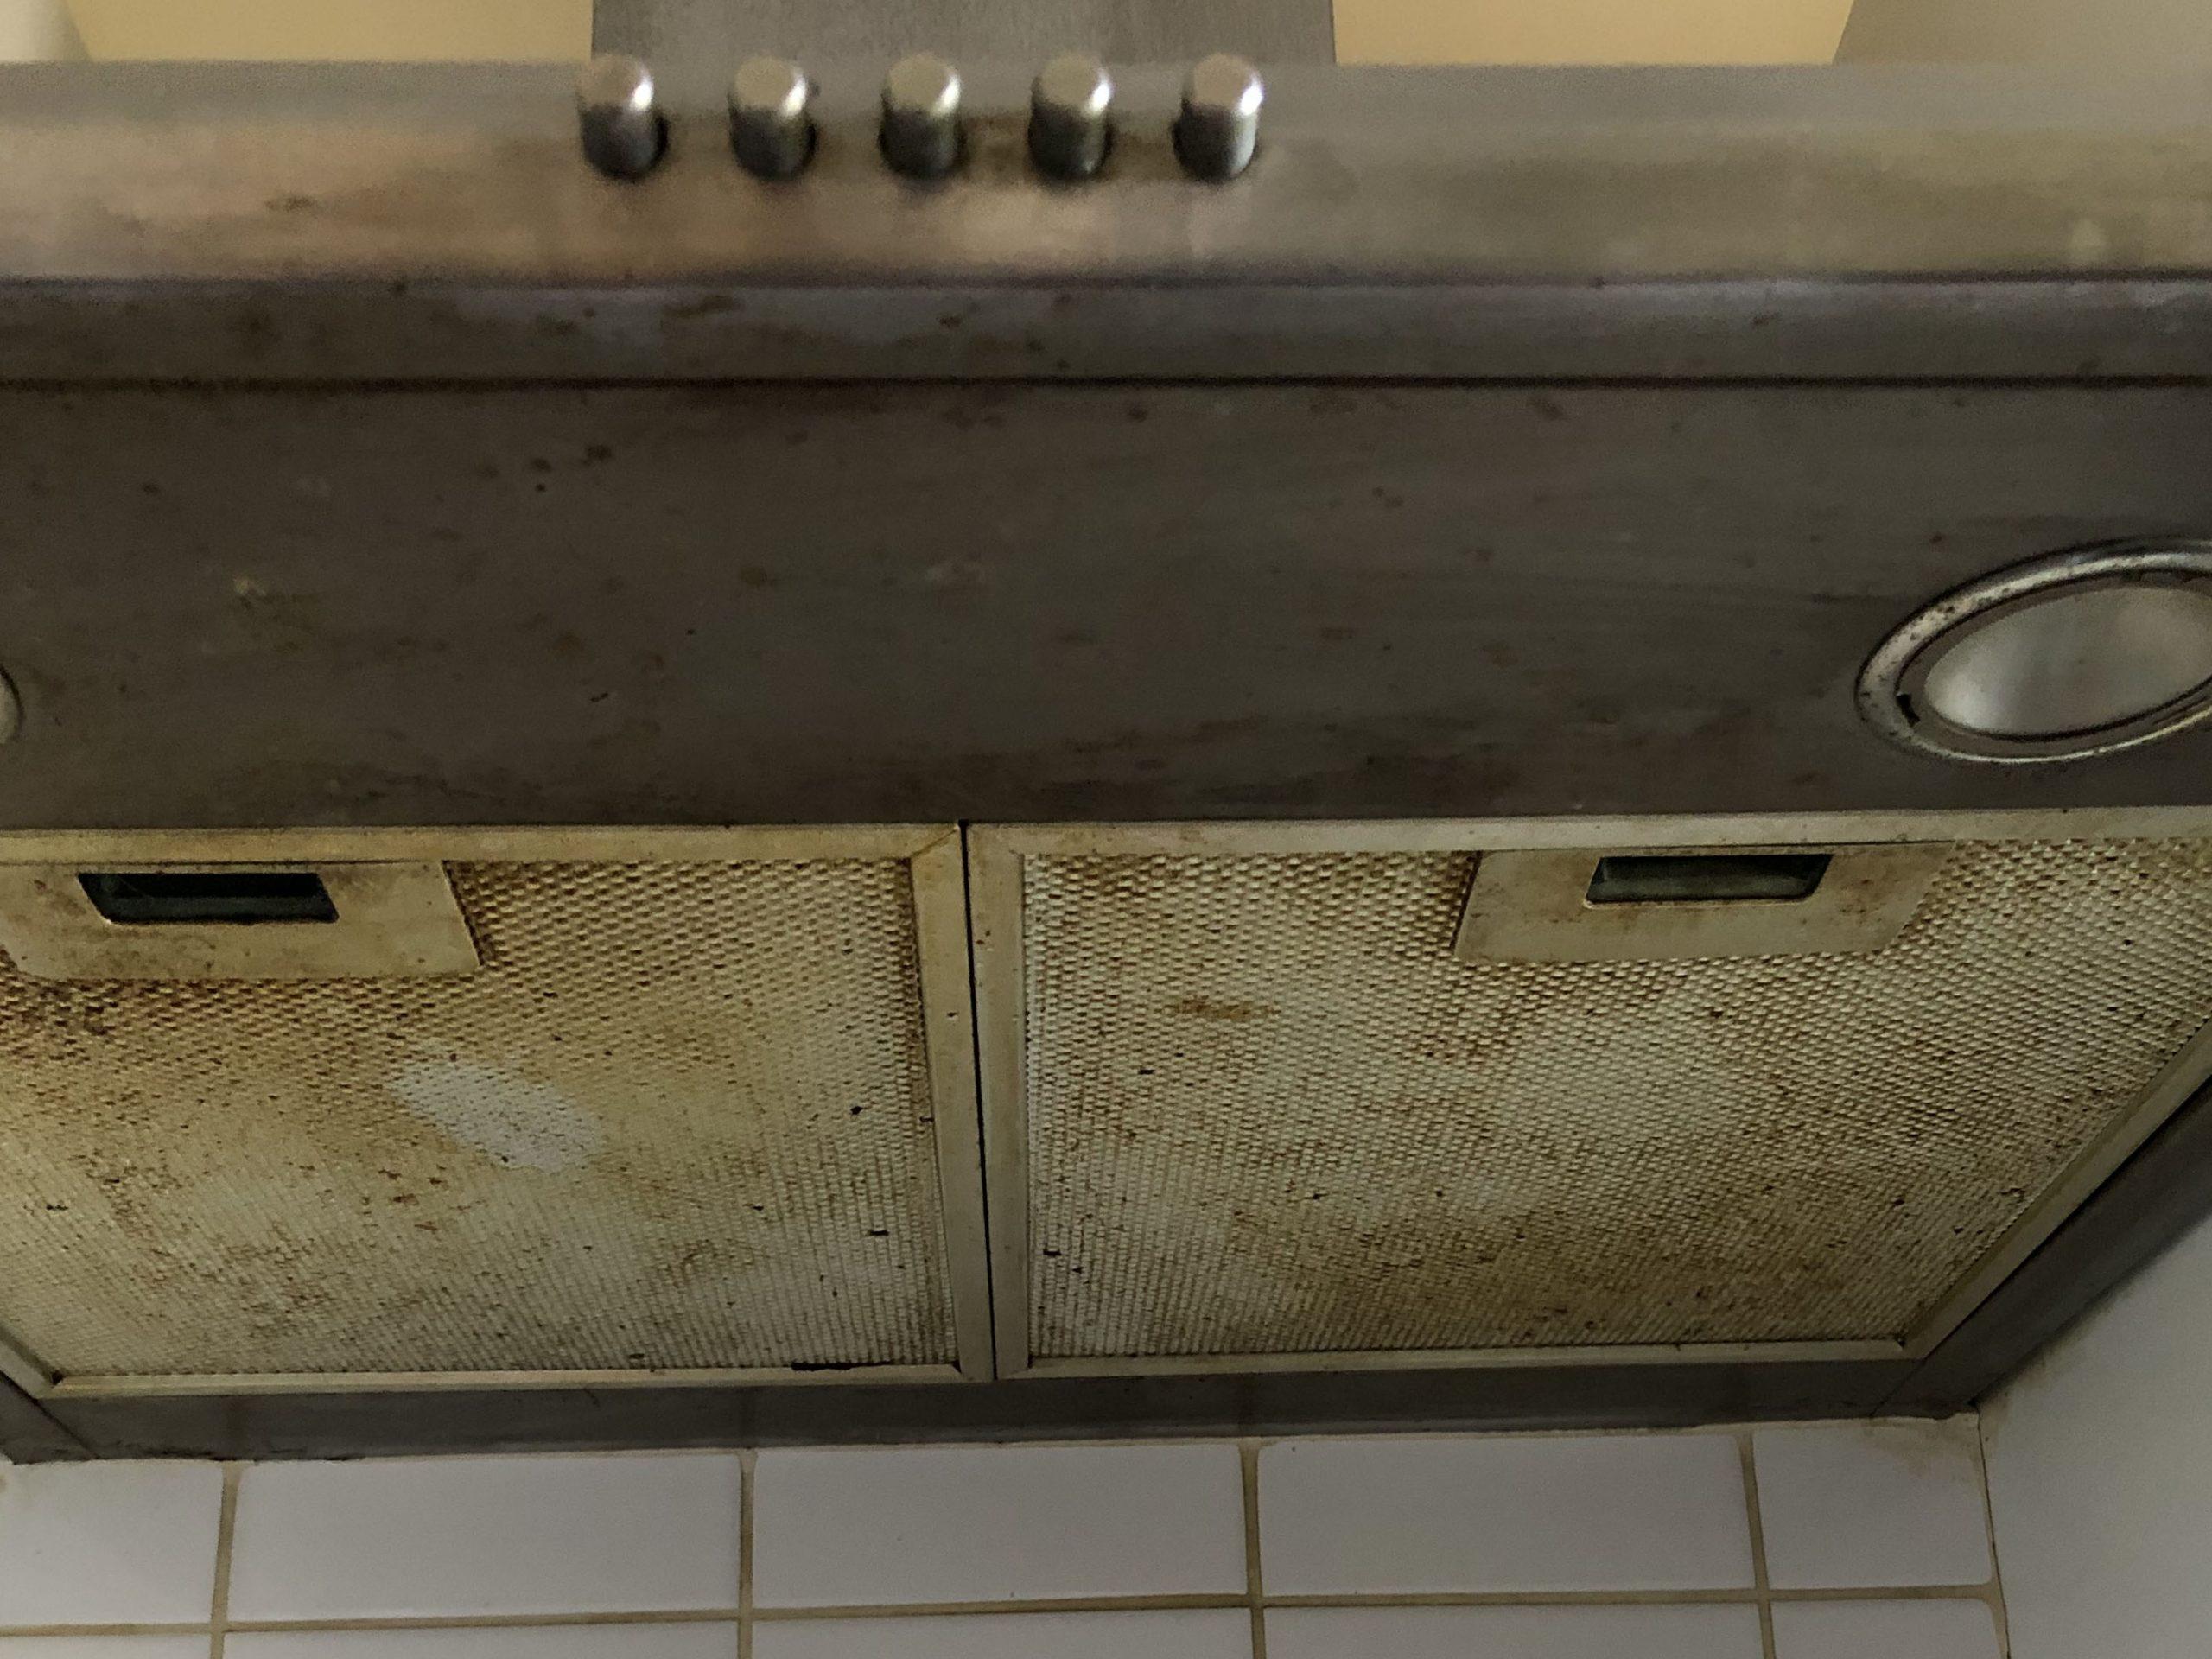 Dirty oven extractor hood